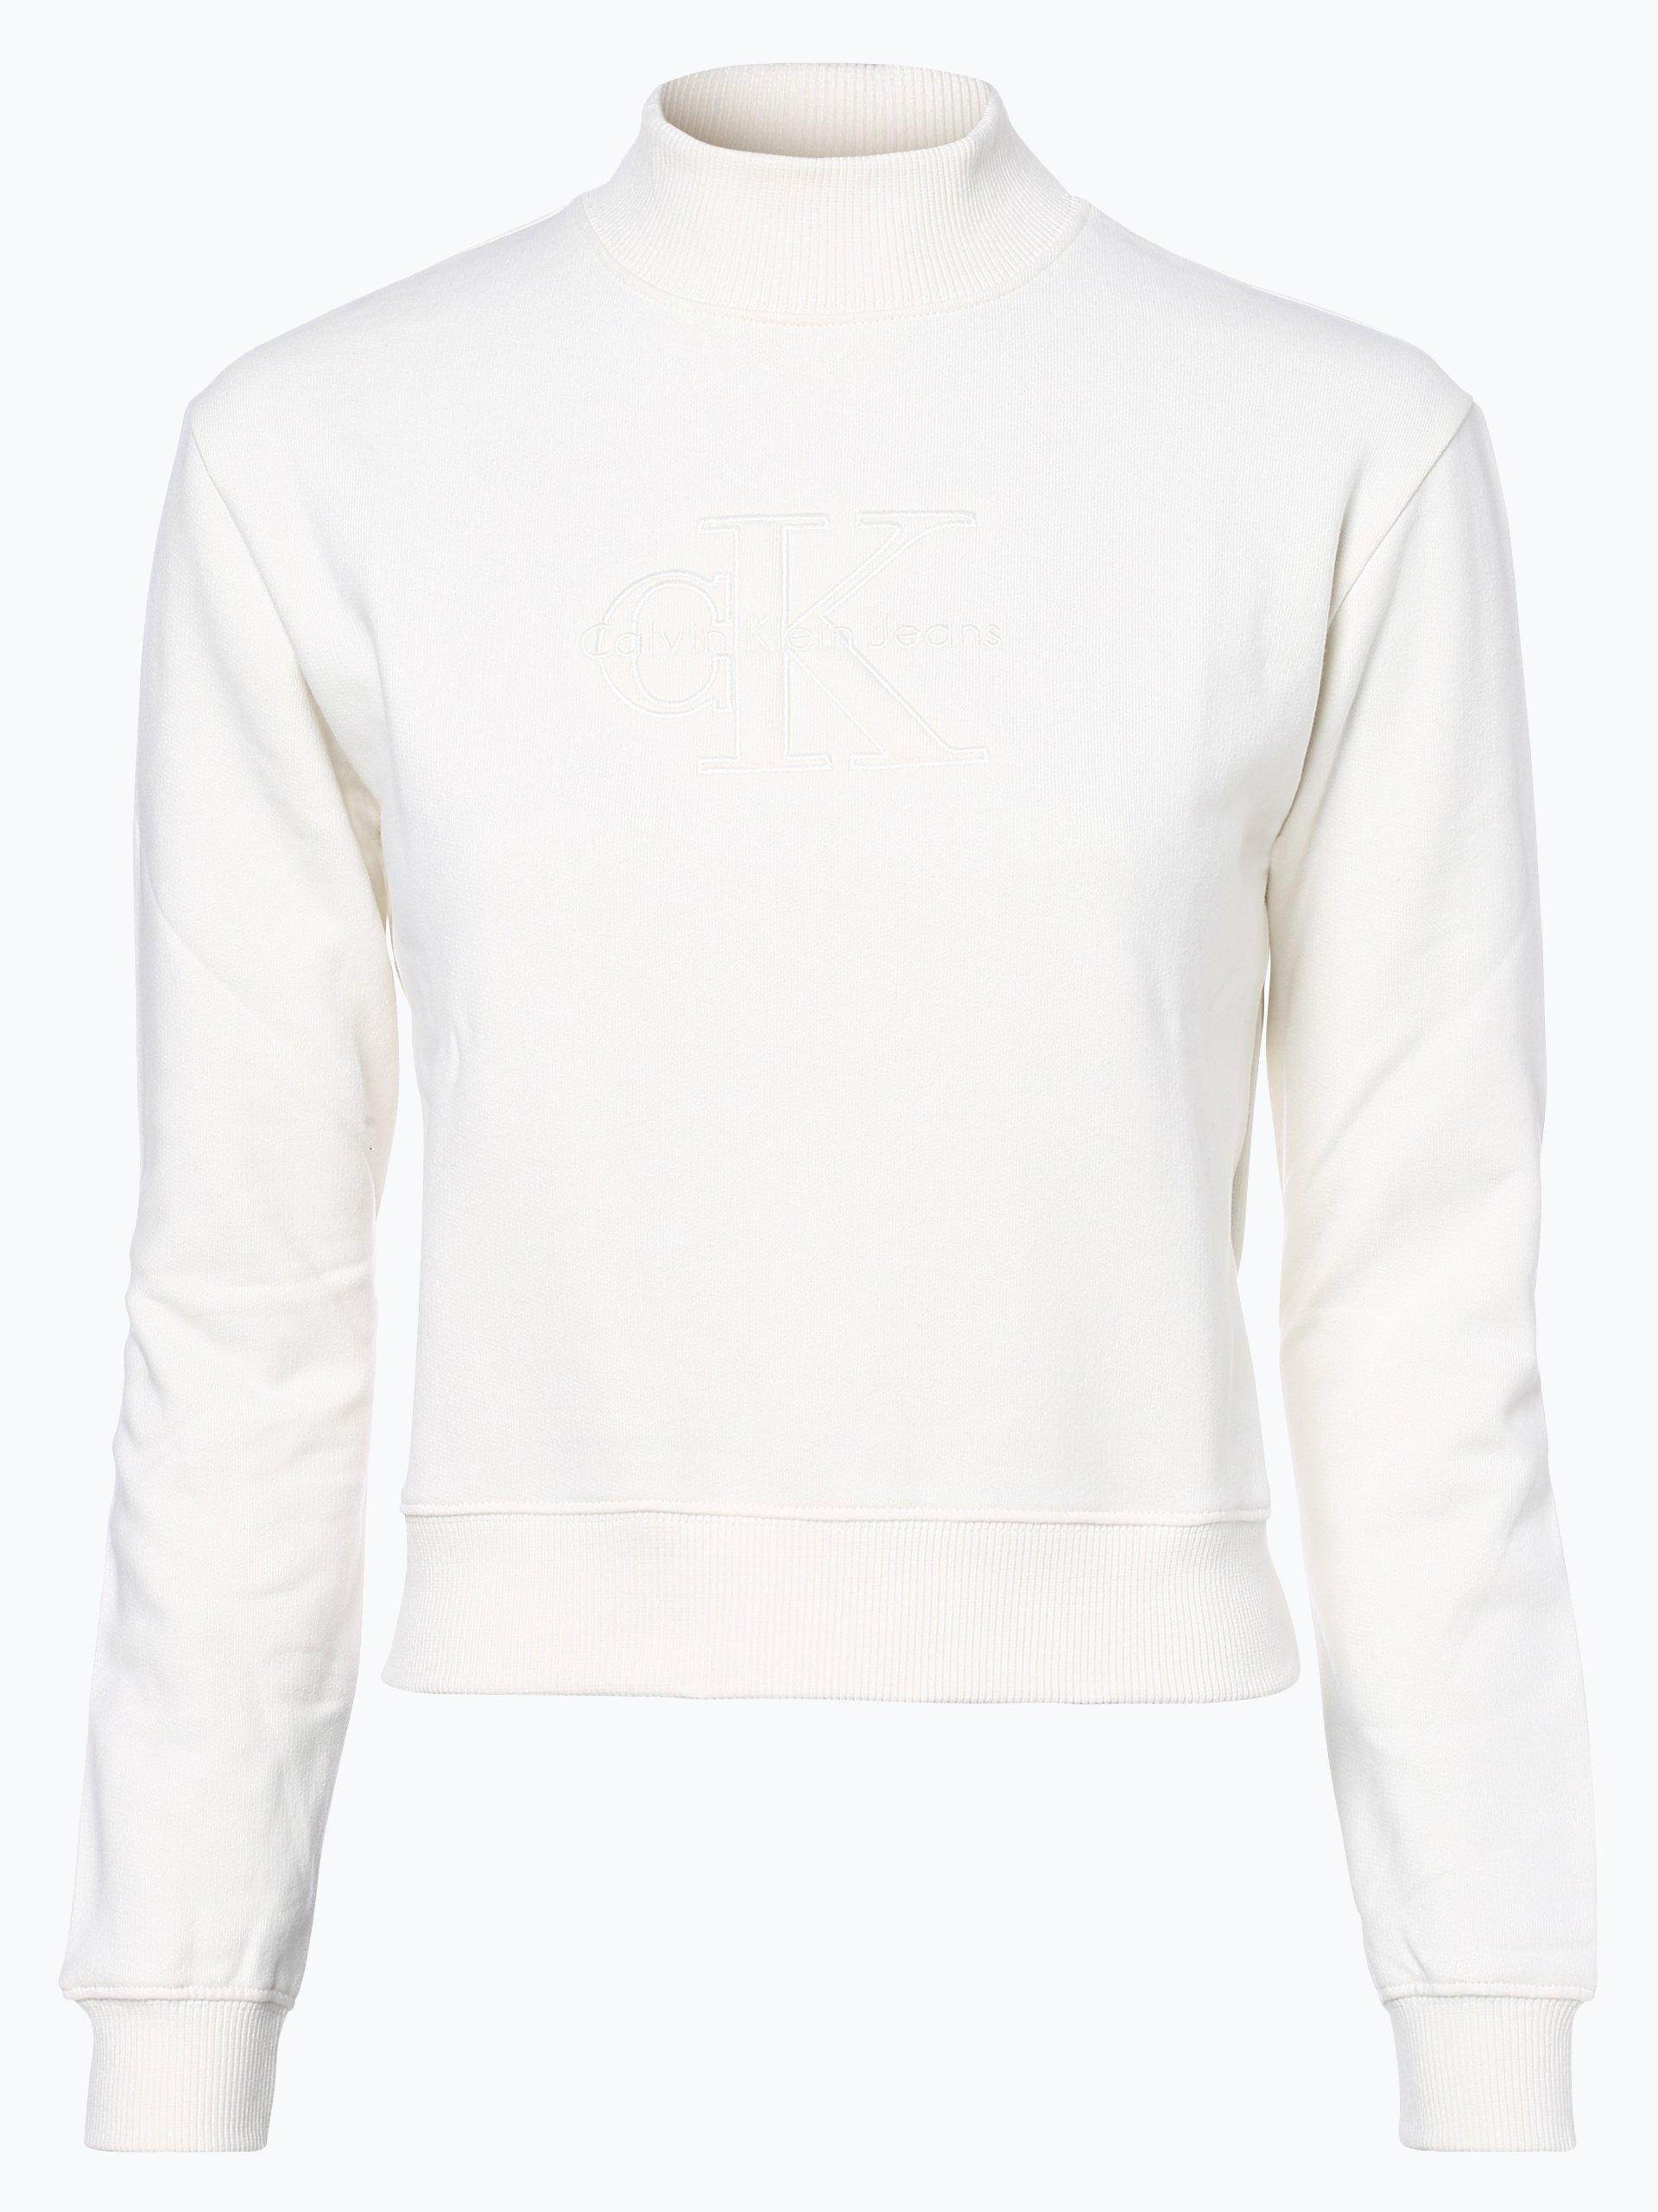 calvin klein jeans damen sweatshirt ecru uni online kaufen vangraaf com. Black Bedroom Furniture Sets. Home Design Ideas